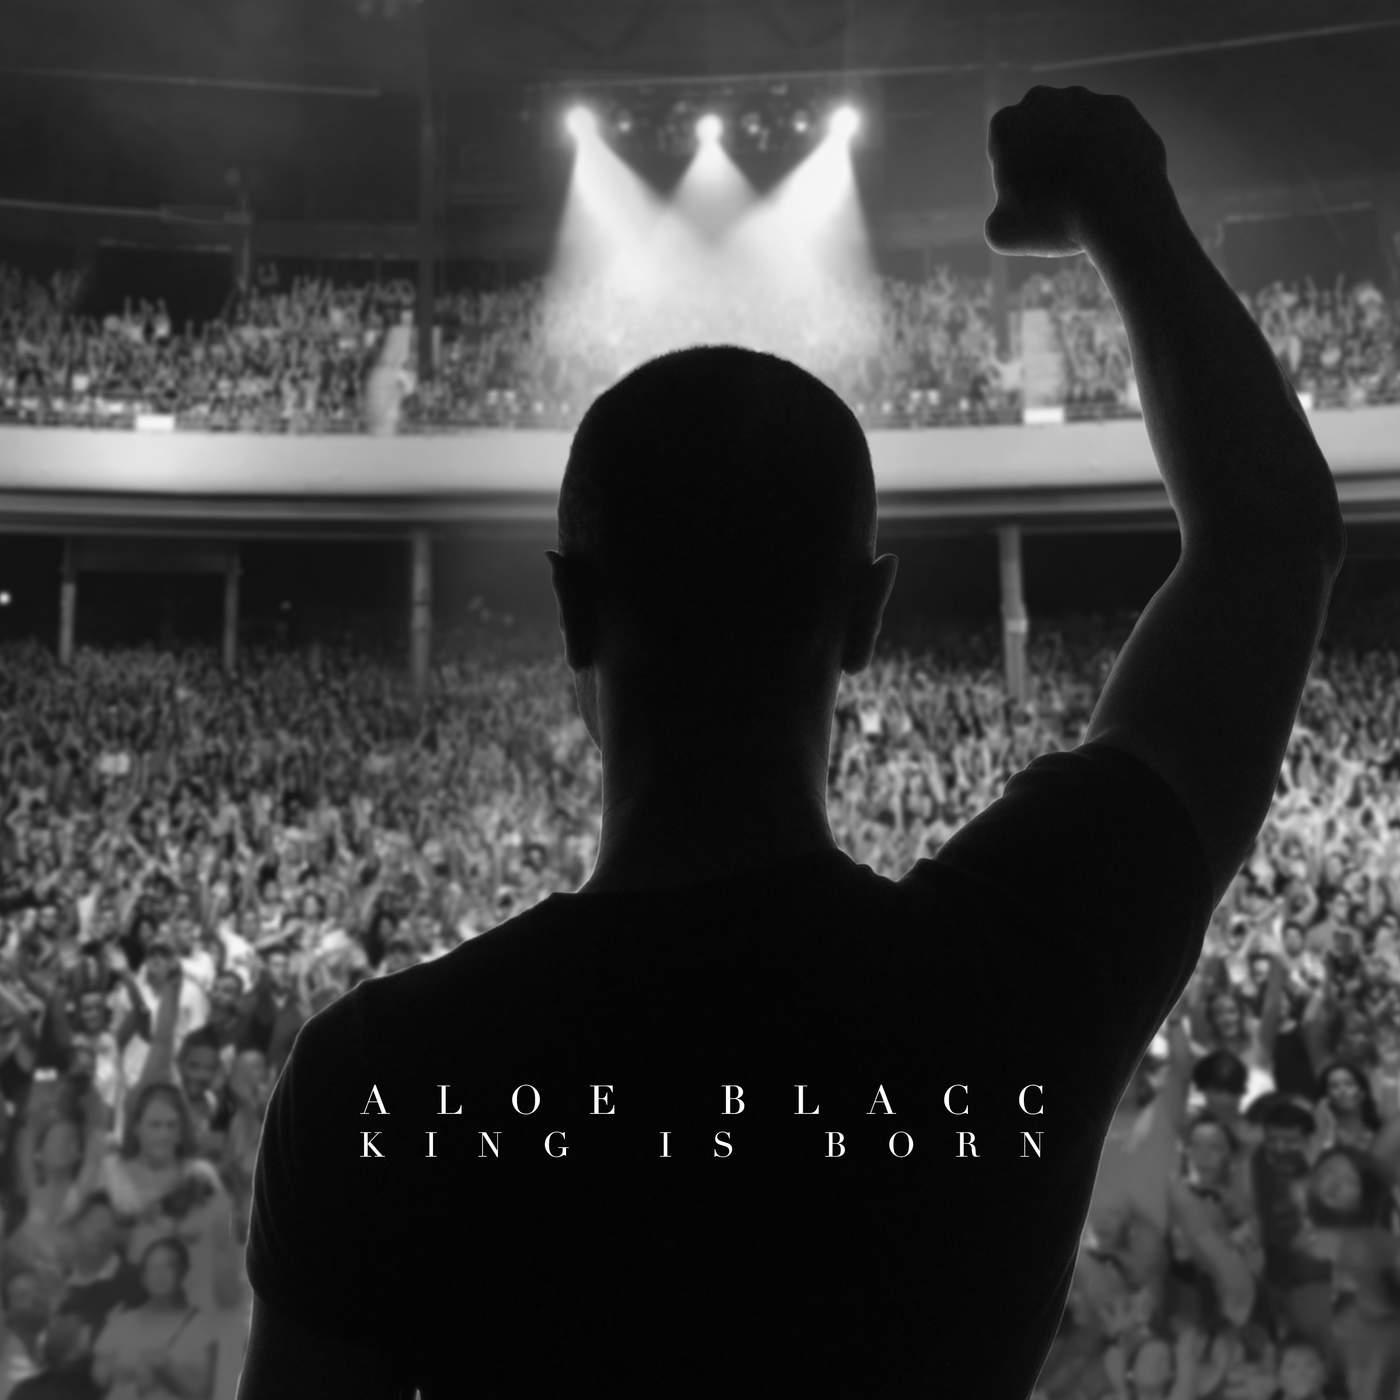 Aloe Blacc - King Is Born - Single Cover